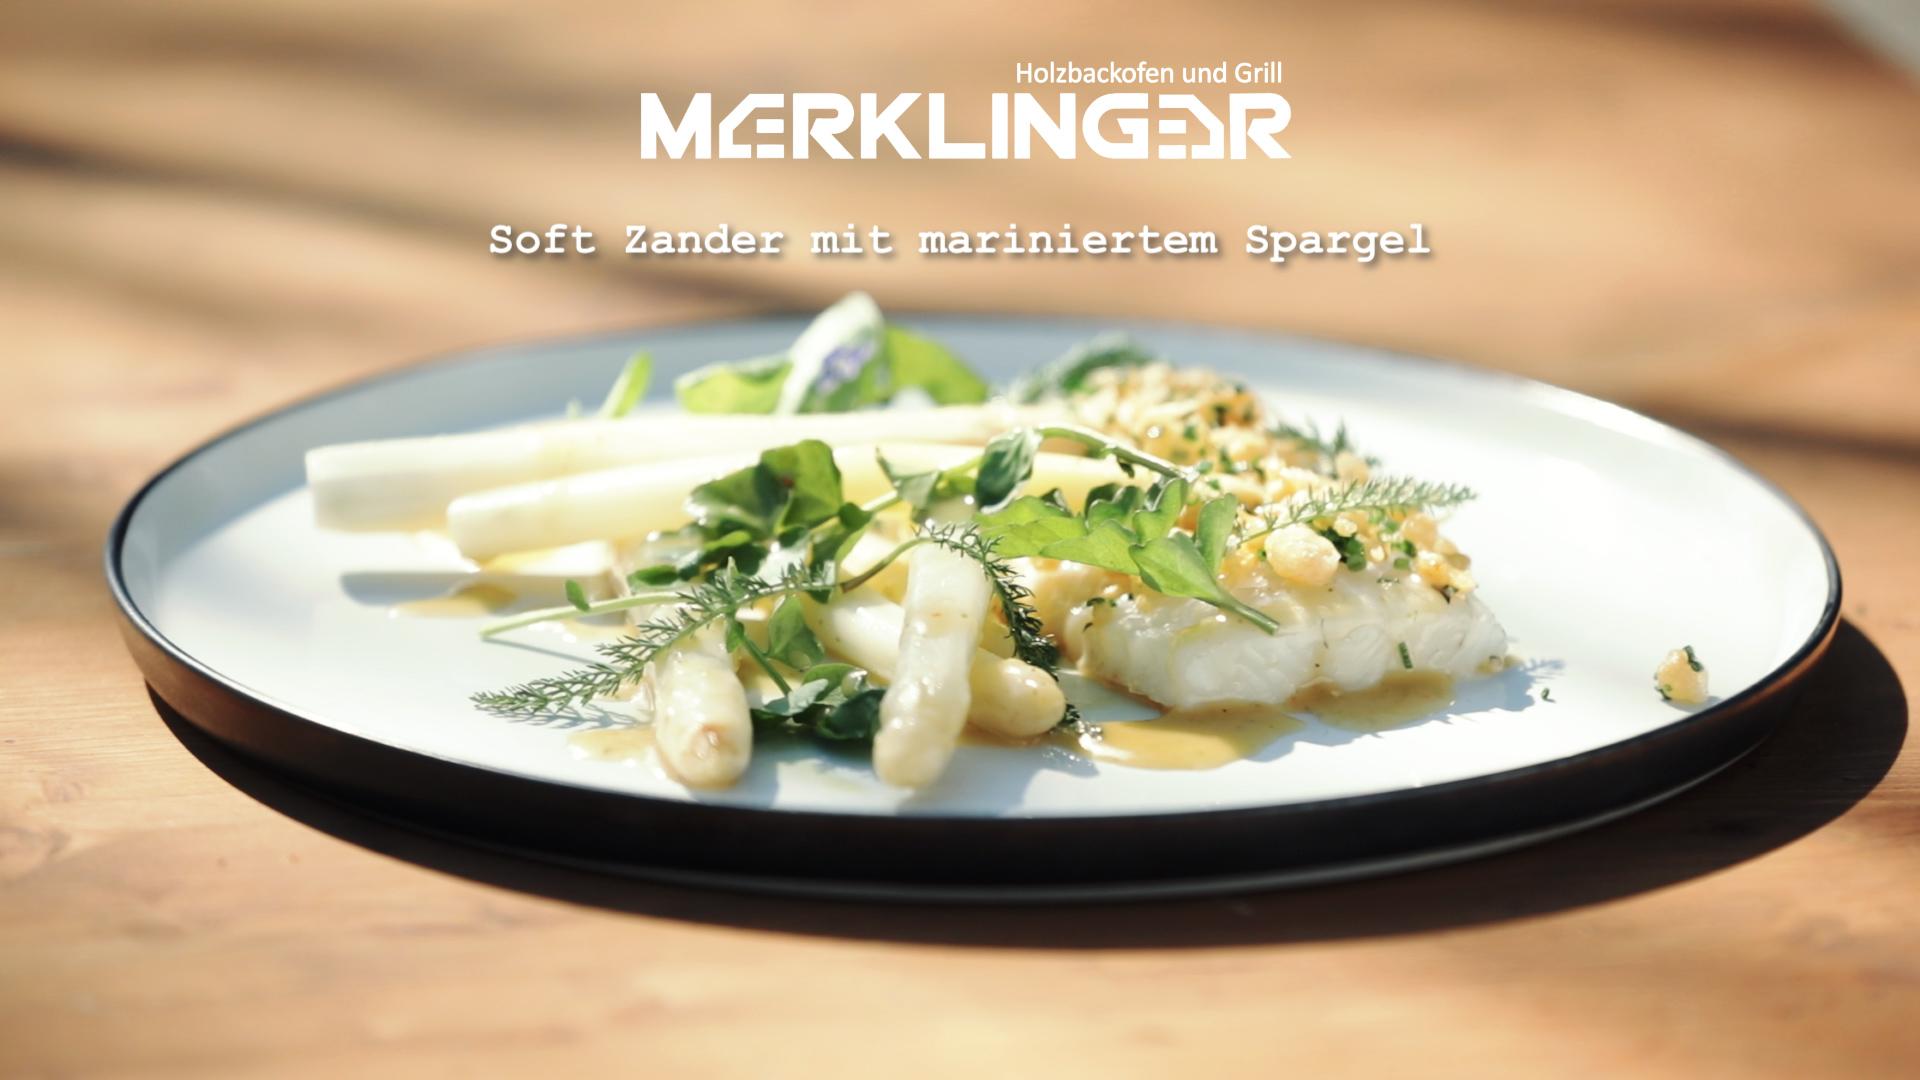 Kochvideo-Reihe mit dem Merklinger, Produktion Matthias Baumgartner Videofotorgrafie